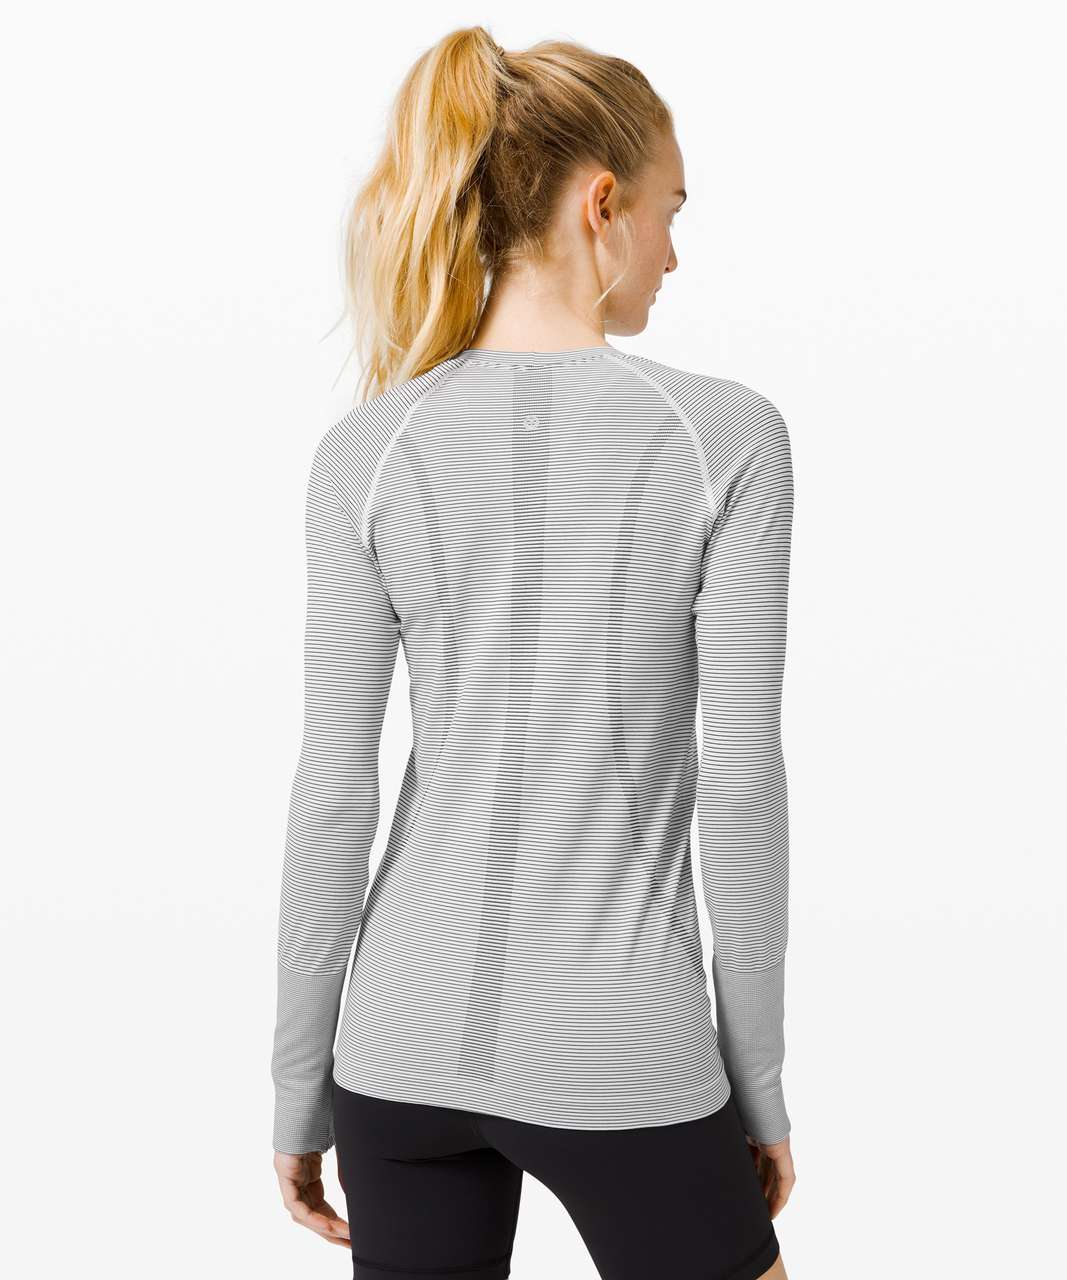 Lululemon Swiftly Tech Long Sleeve 2.0 - Tempo Stripe White Black